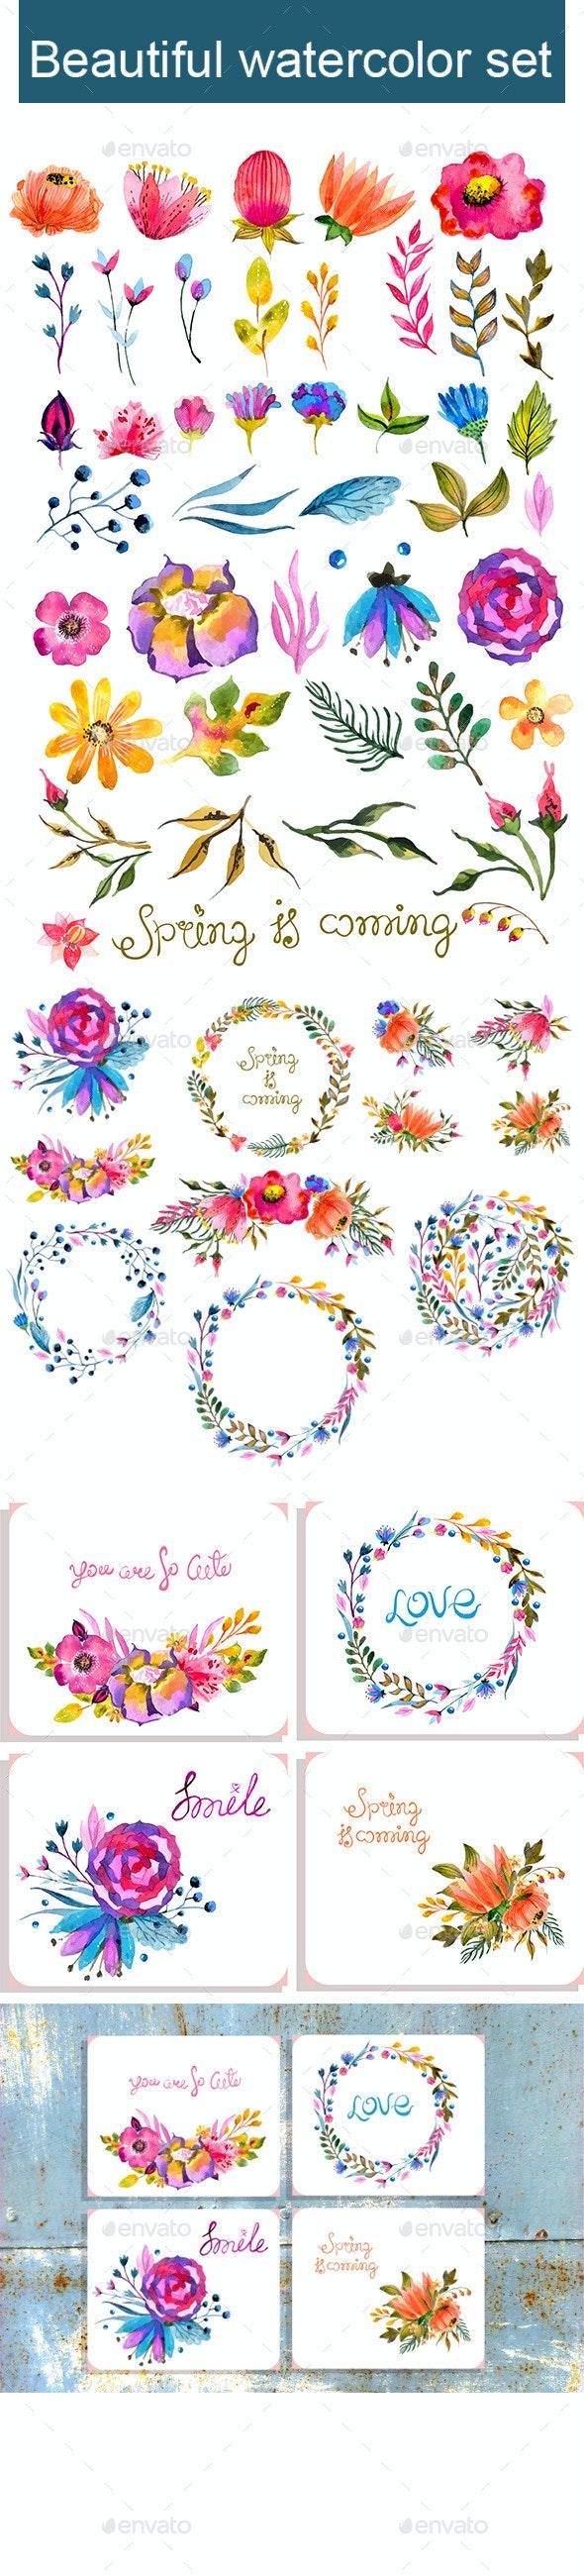 Big Watercolor Floral Collection - Flowers & Plants Nature